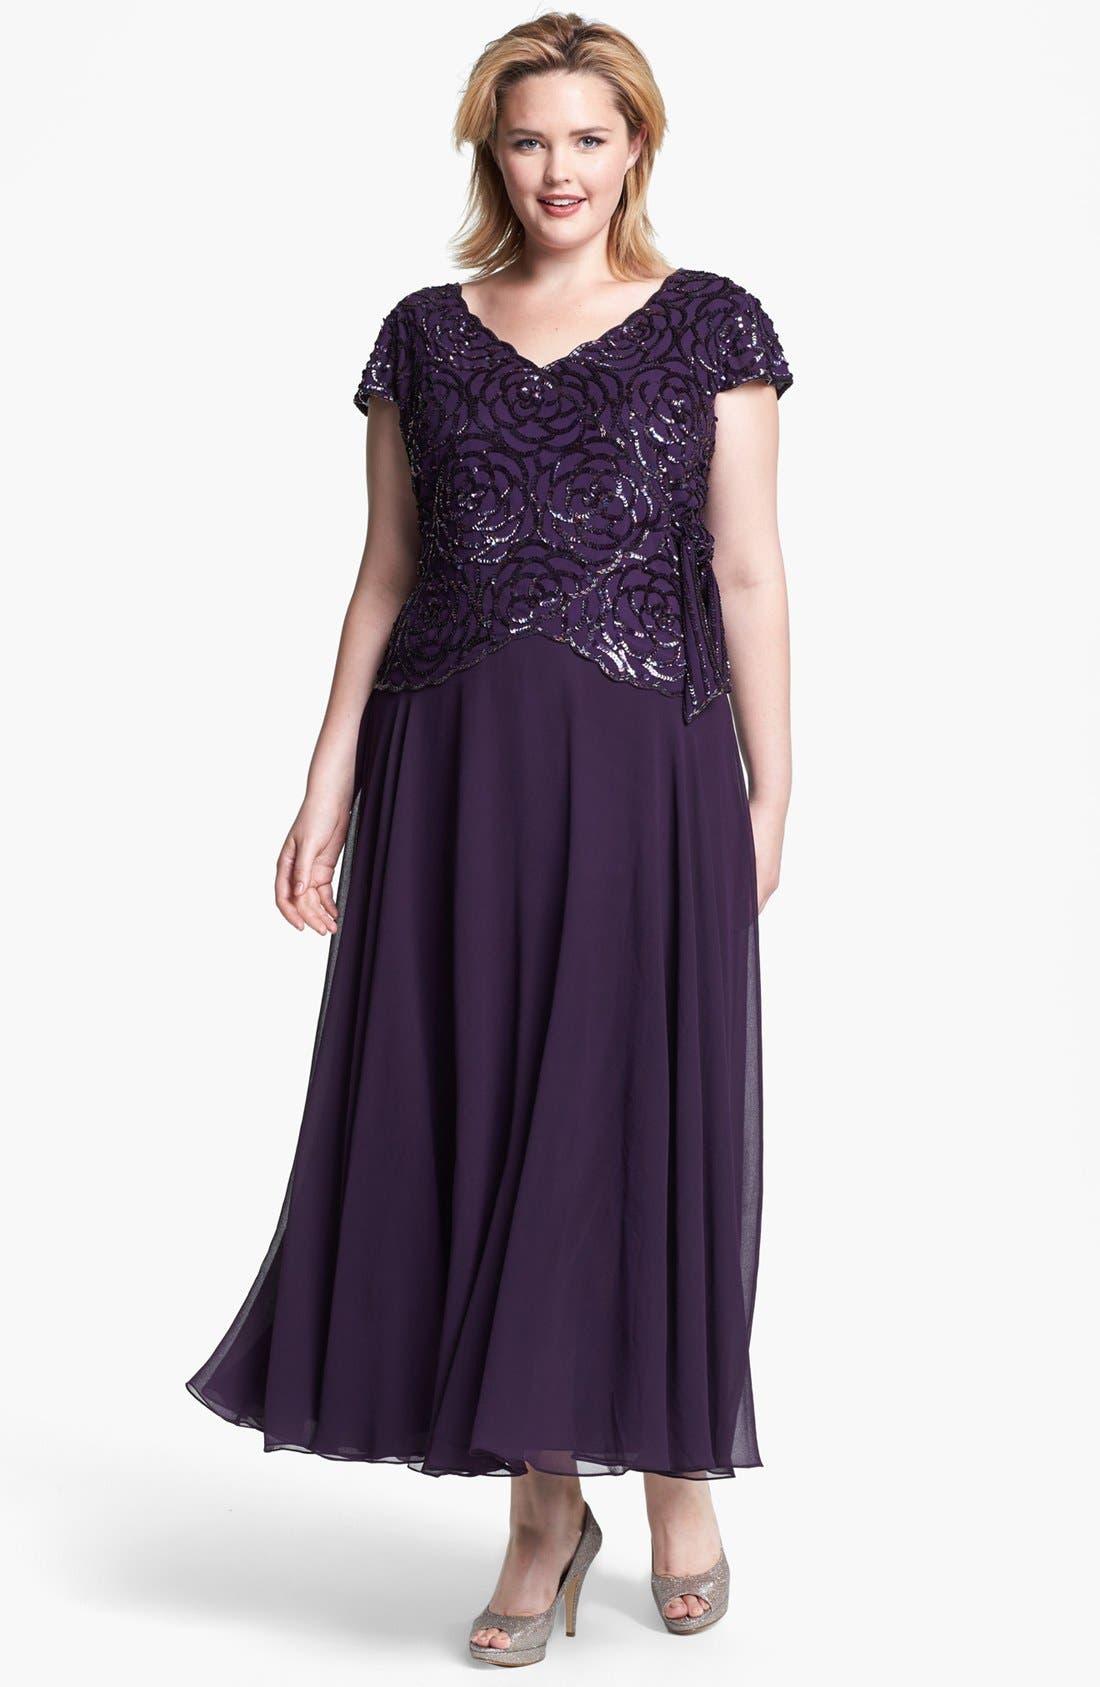 Alternate Image 1 Selected - J Kara Embellished Mock Two Piece Gown